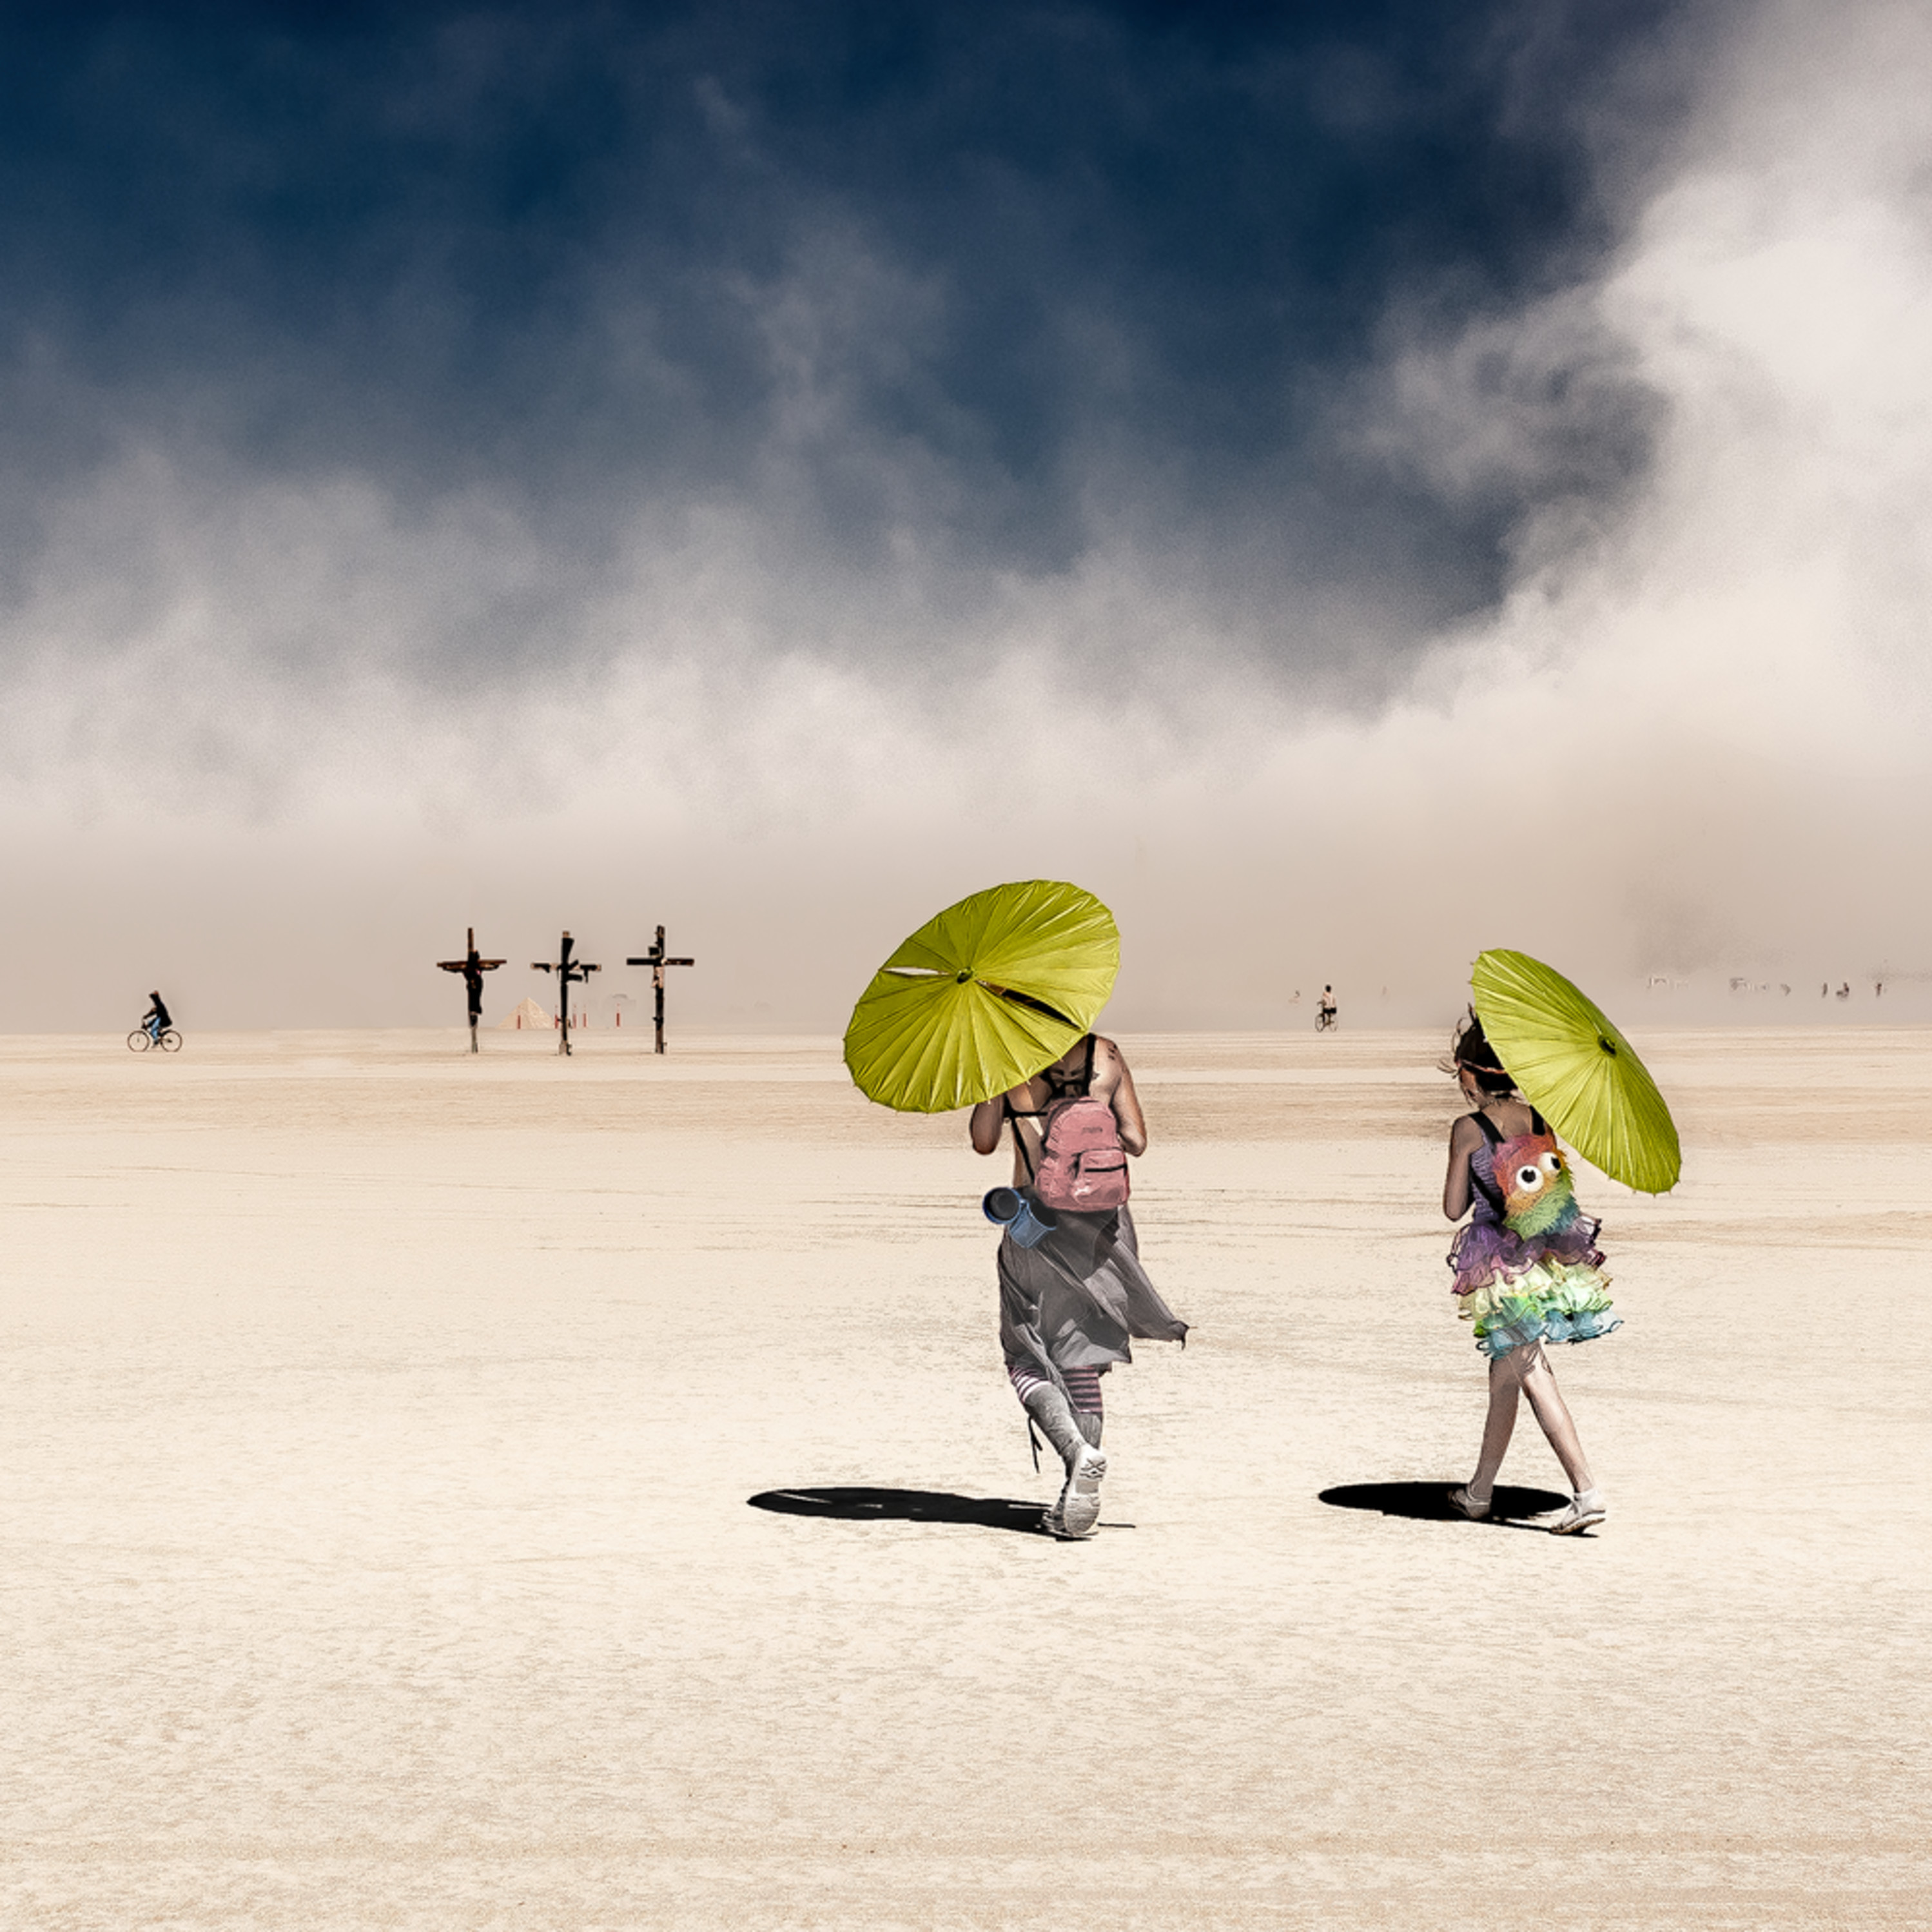 Umbrellas 17x9.99 kimqbm